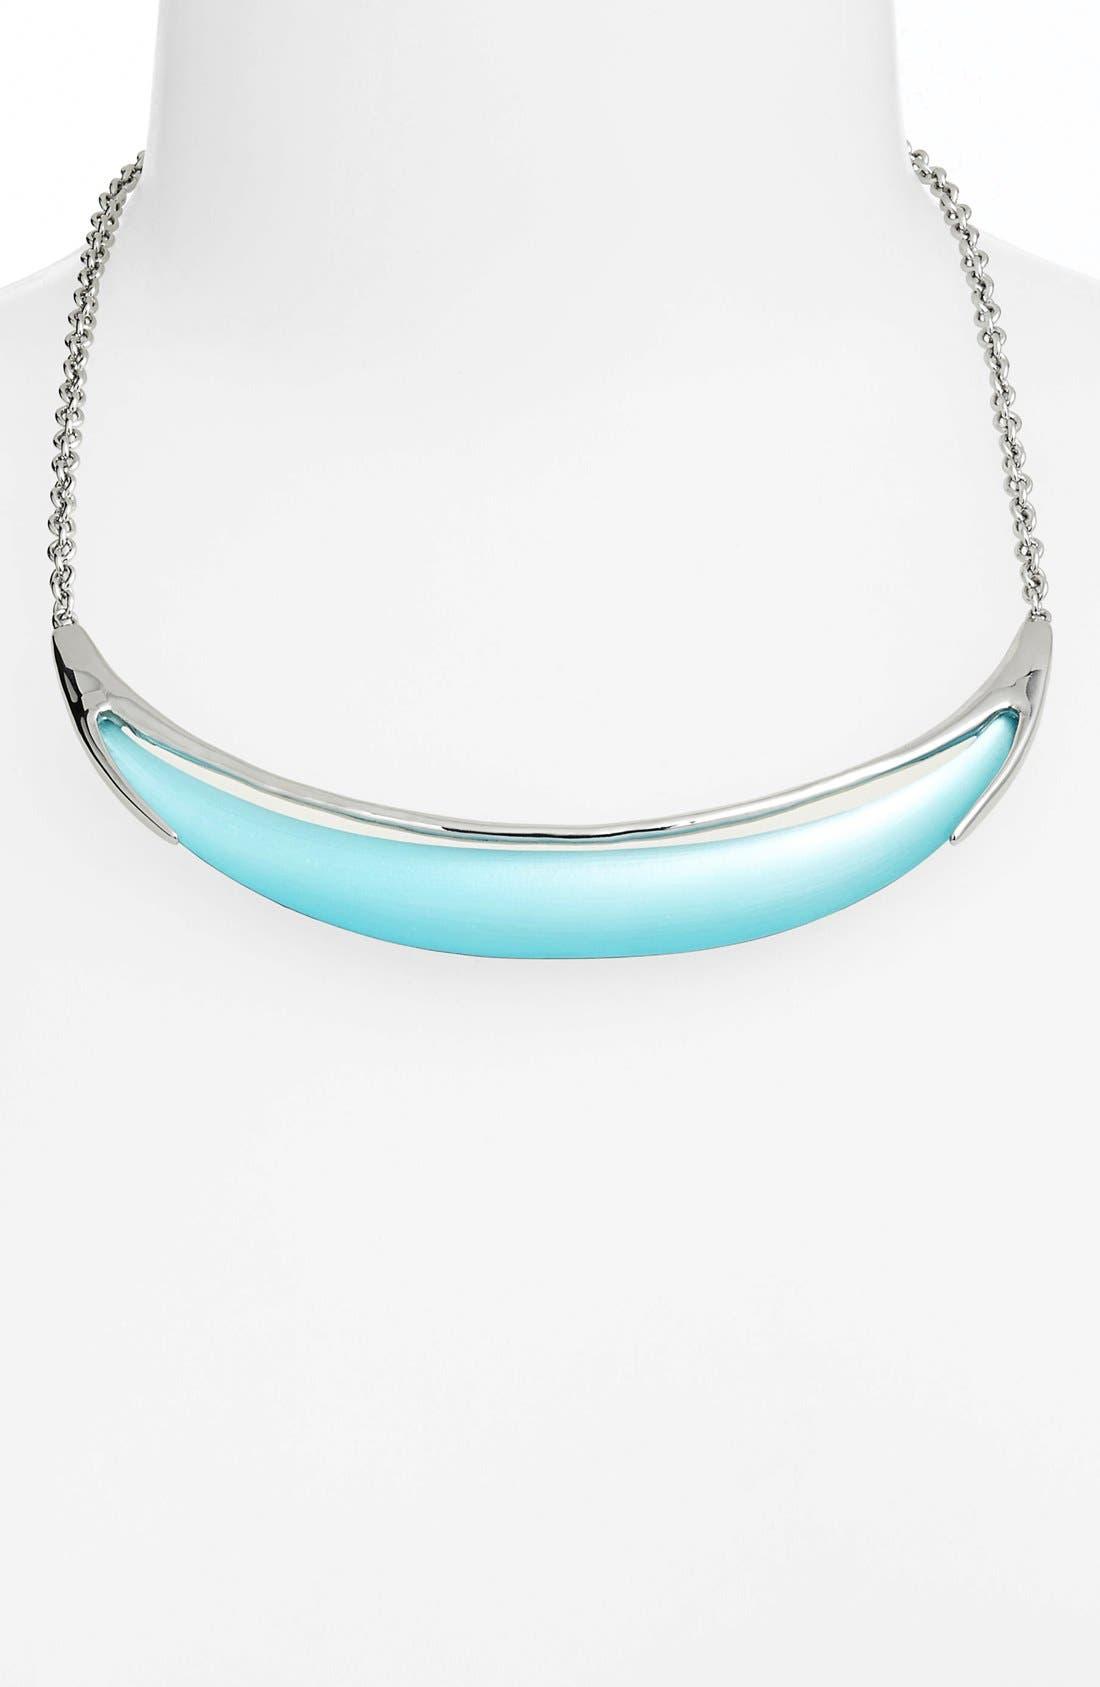 Alternate Image 1 Selected - Alexis Bittar 'Lucite® - Neon Deco' Crescent Necklace